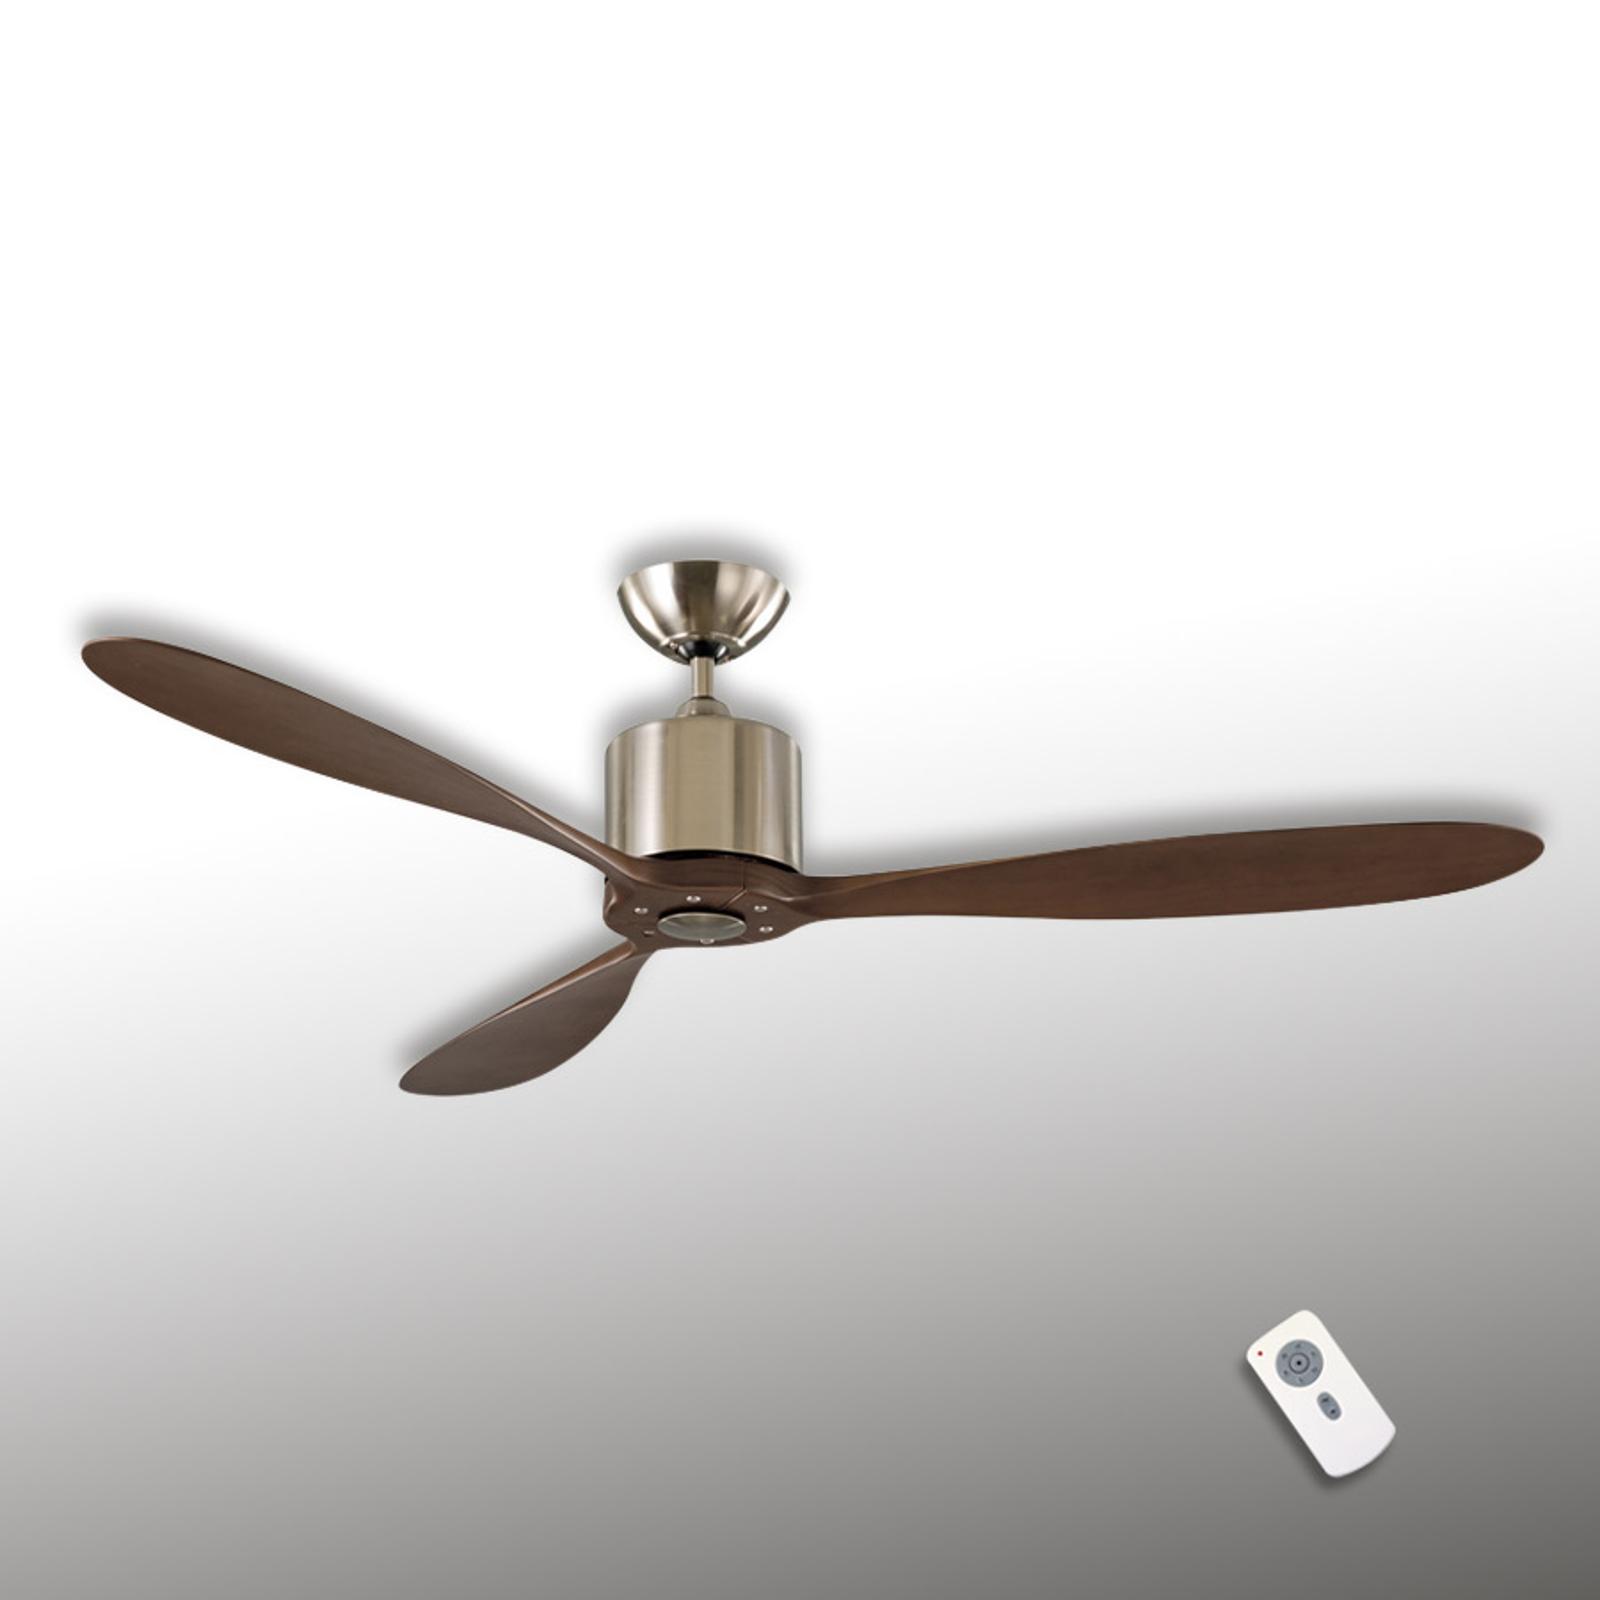 Aeroplan Eco plafondventilator, chroom, notenboom